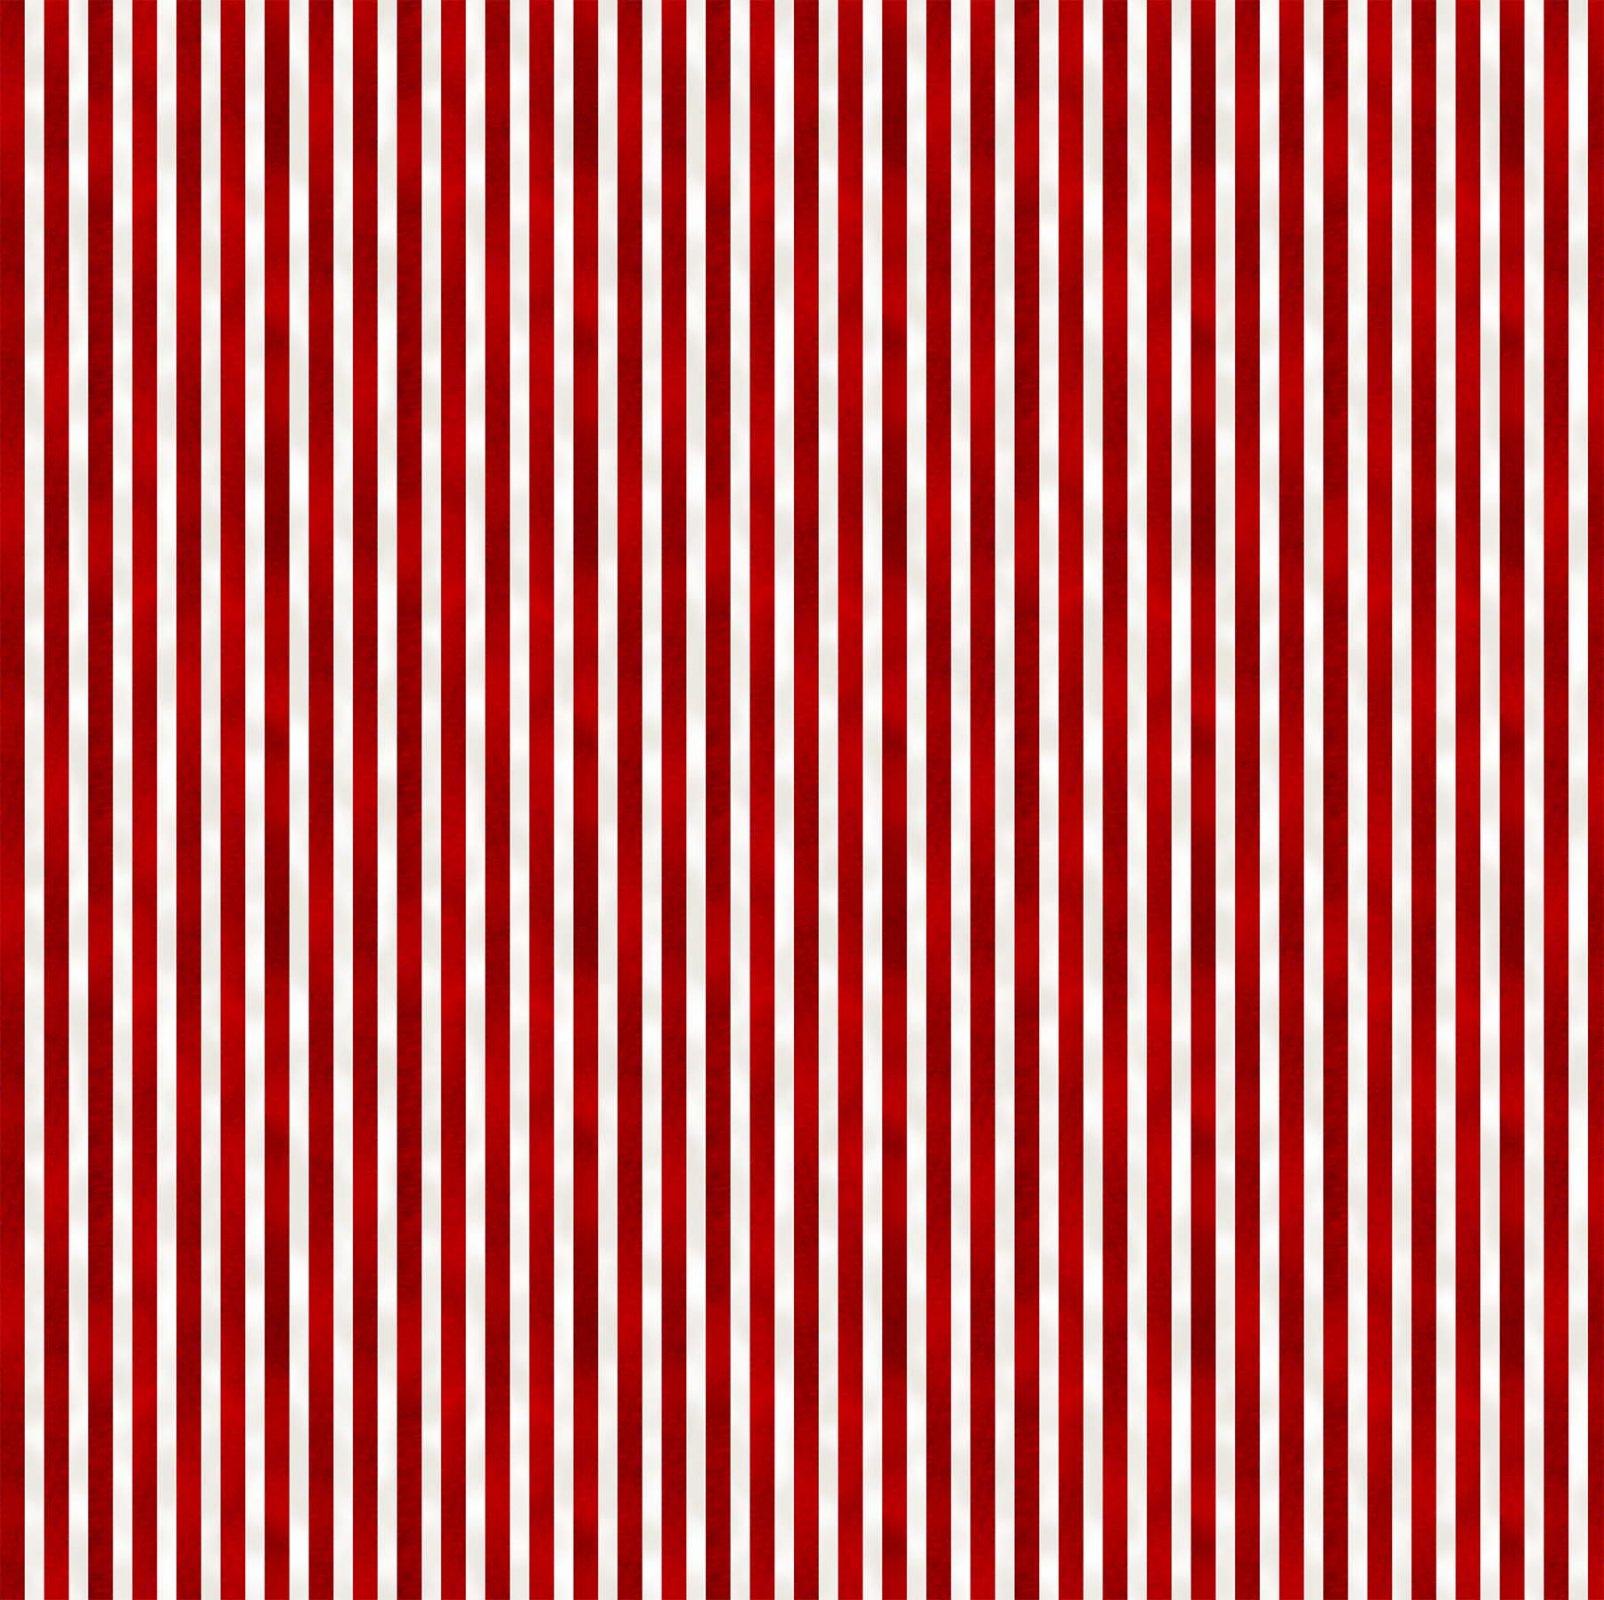 23435-10 Stripe Red_White LIBERTY RIDE 2 Northcott